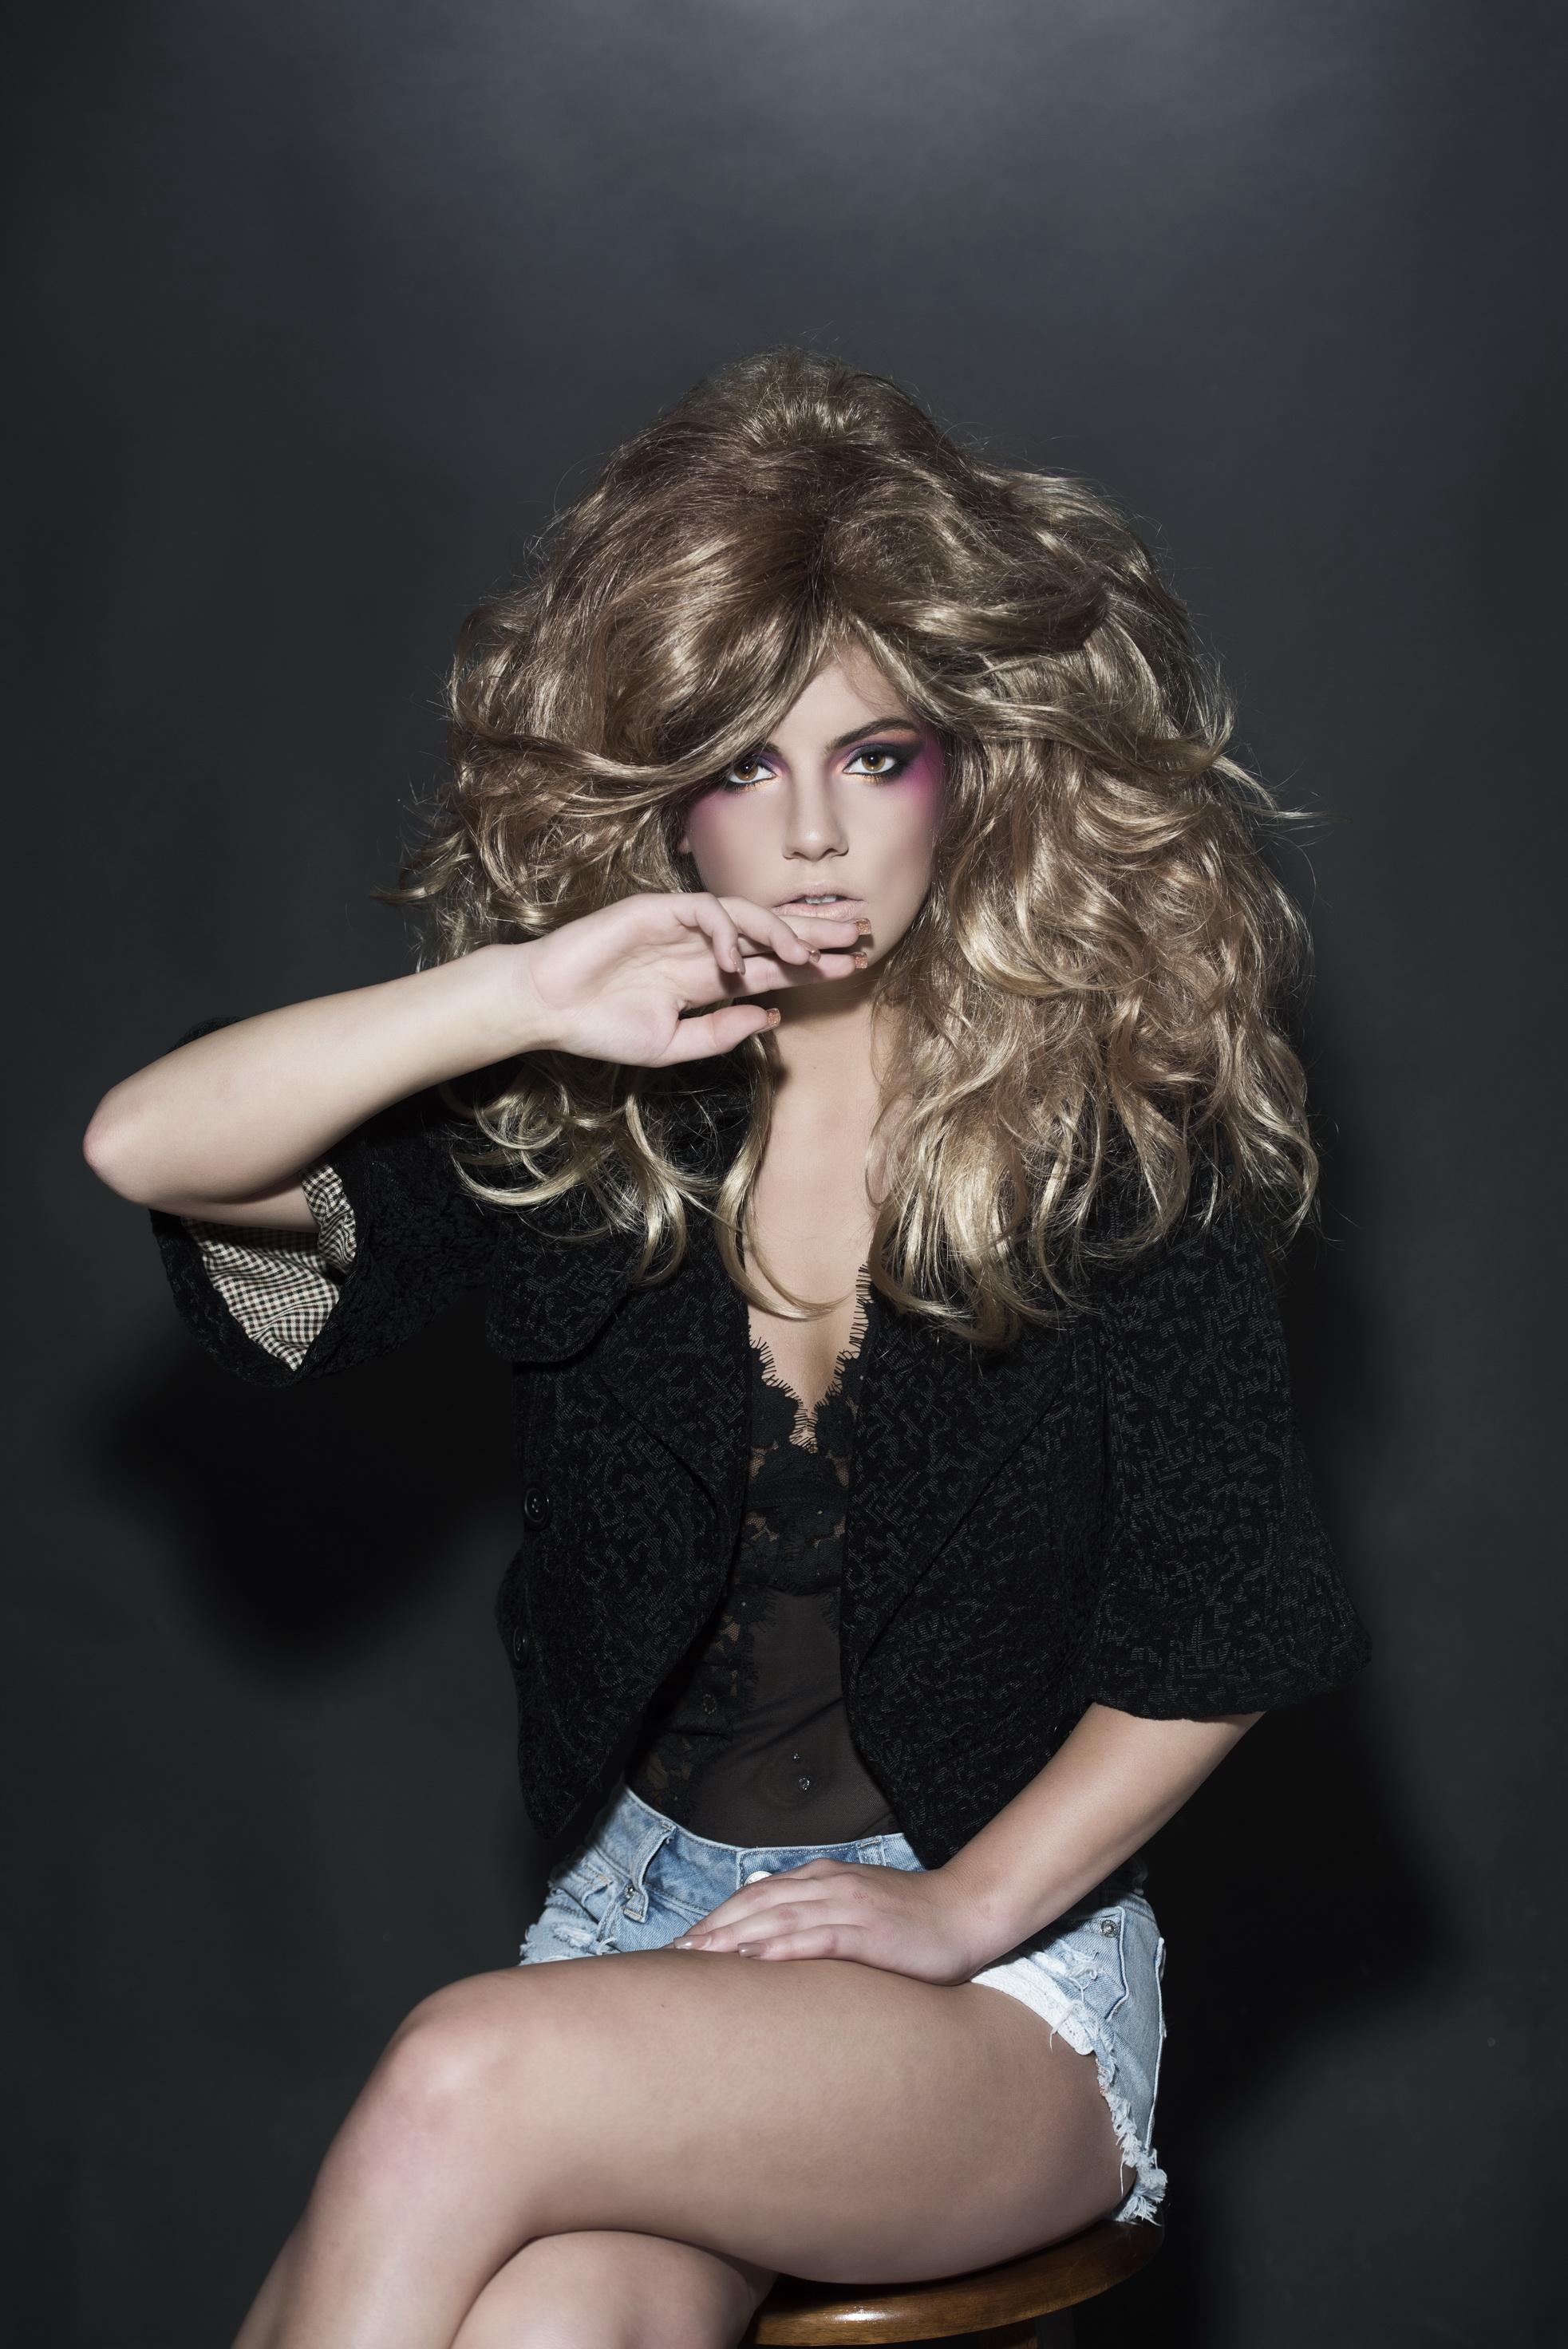 Shaun alexander fashion photographer 37